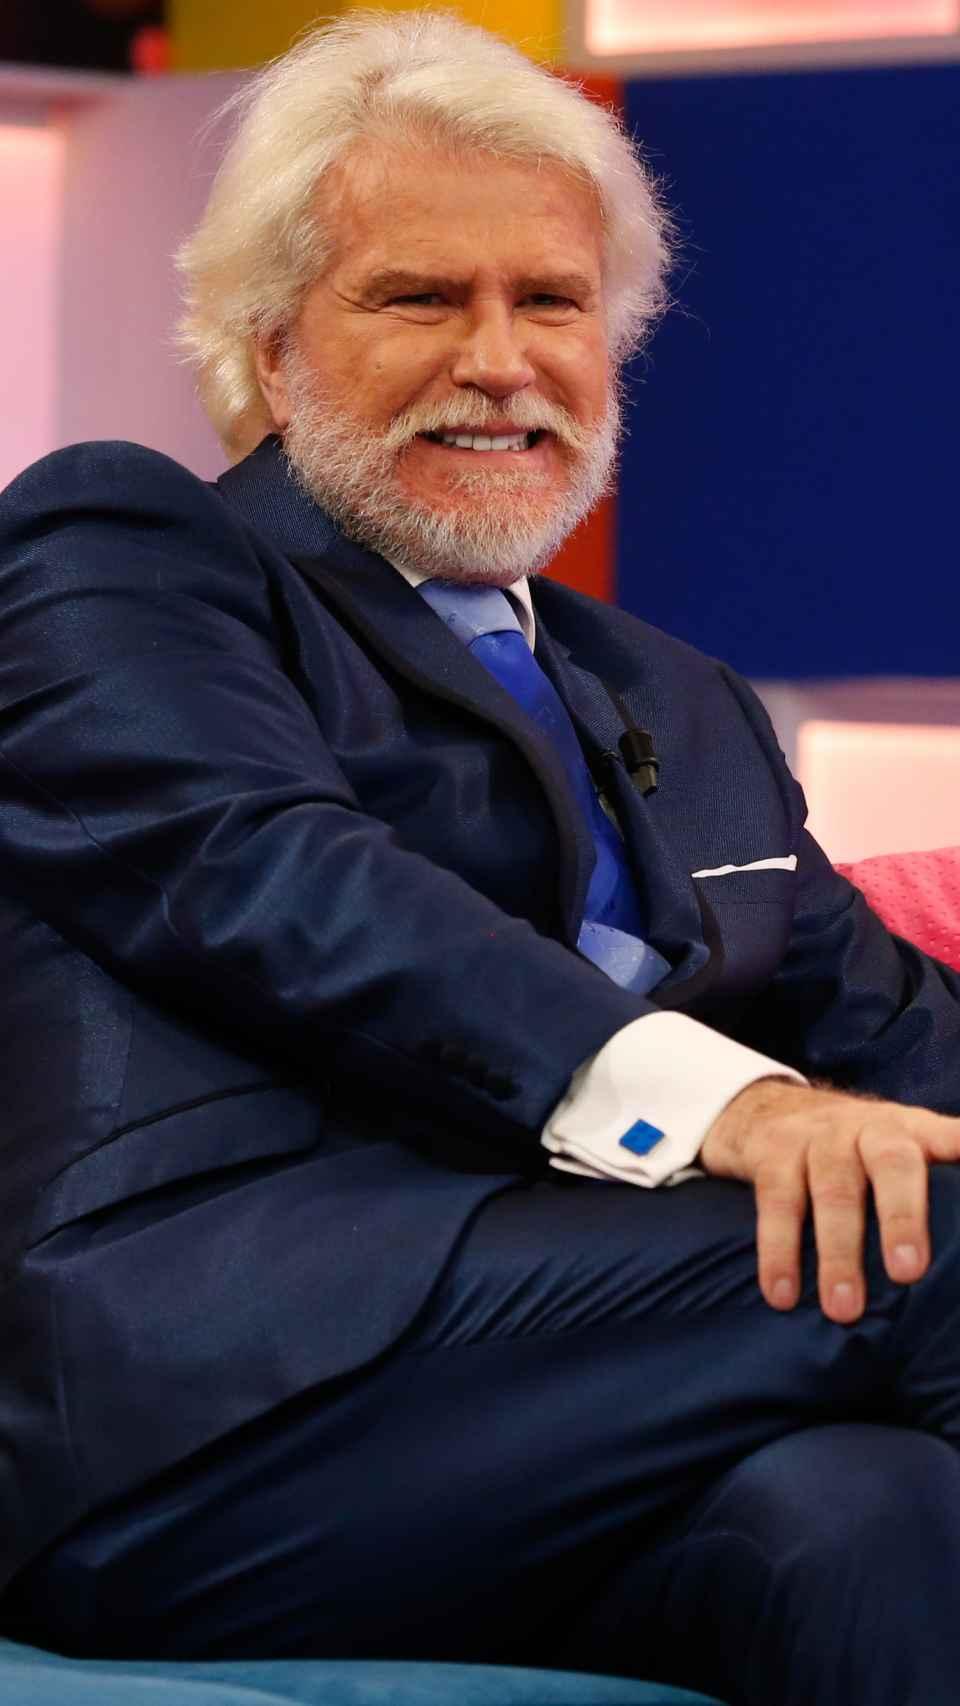 Edmundo en un programa en noviembre de 2019.